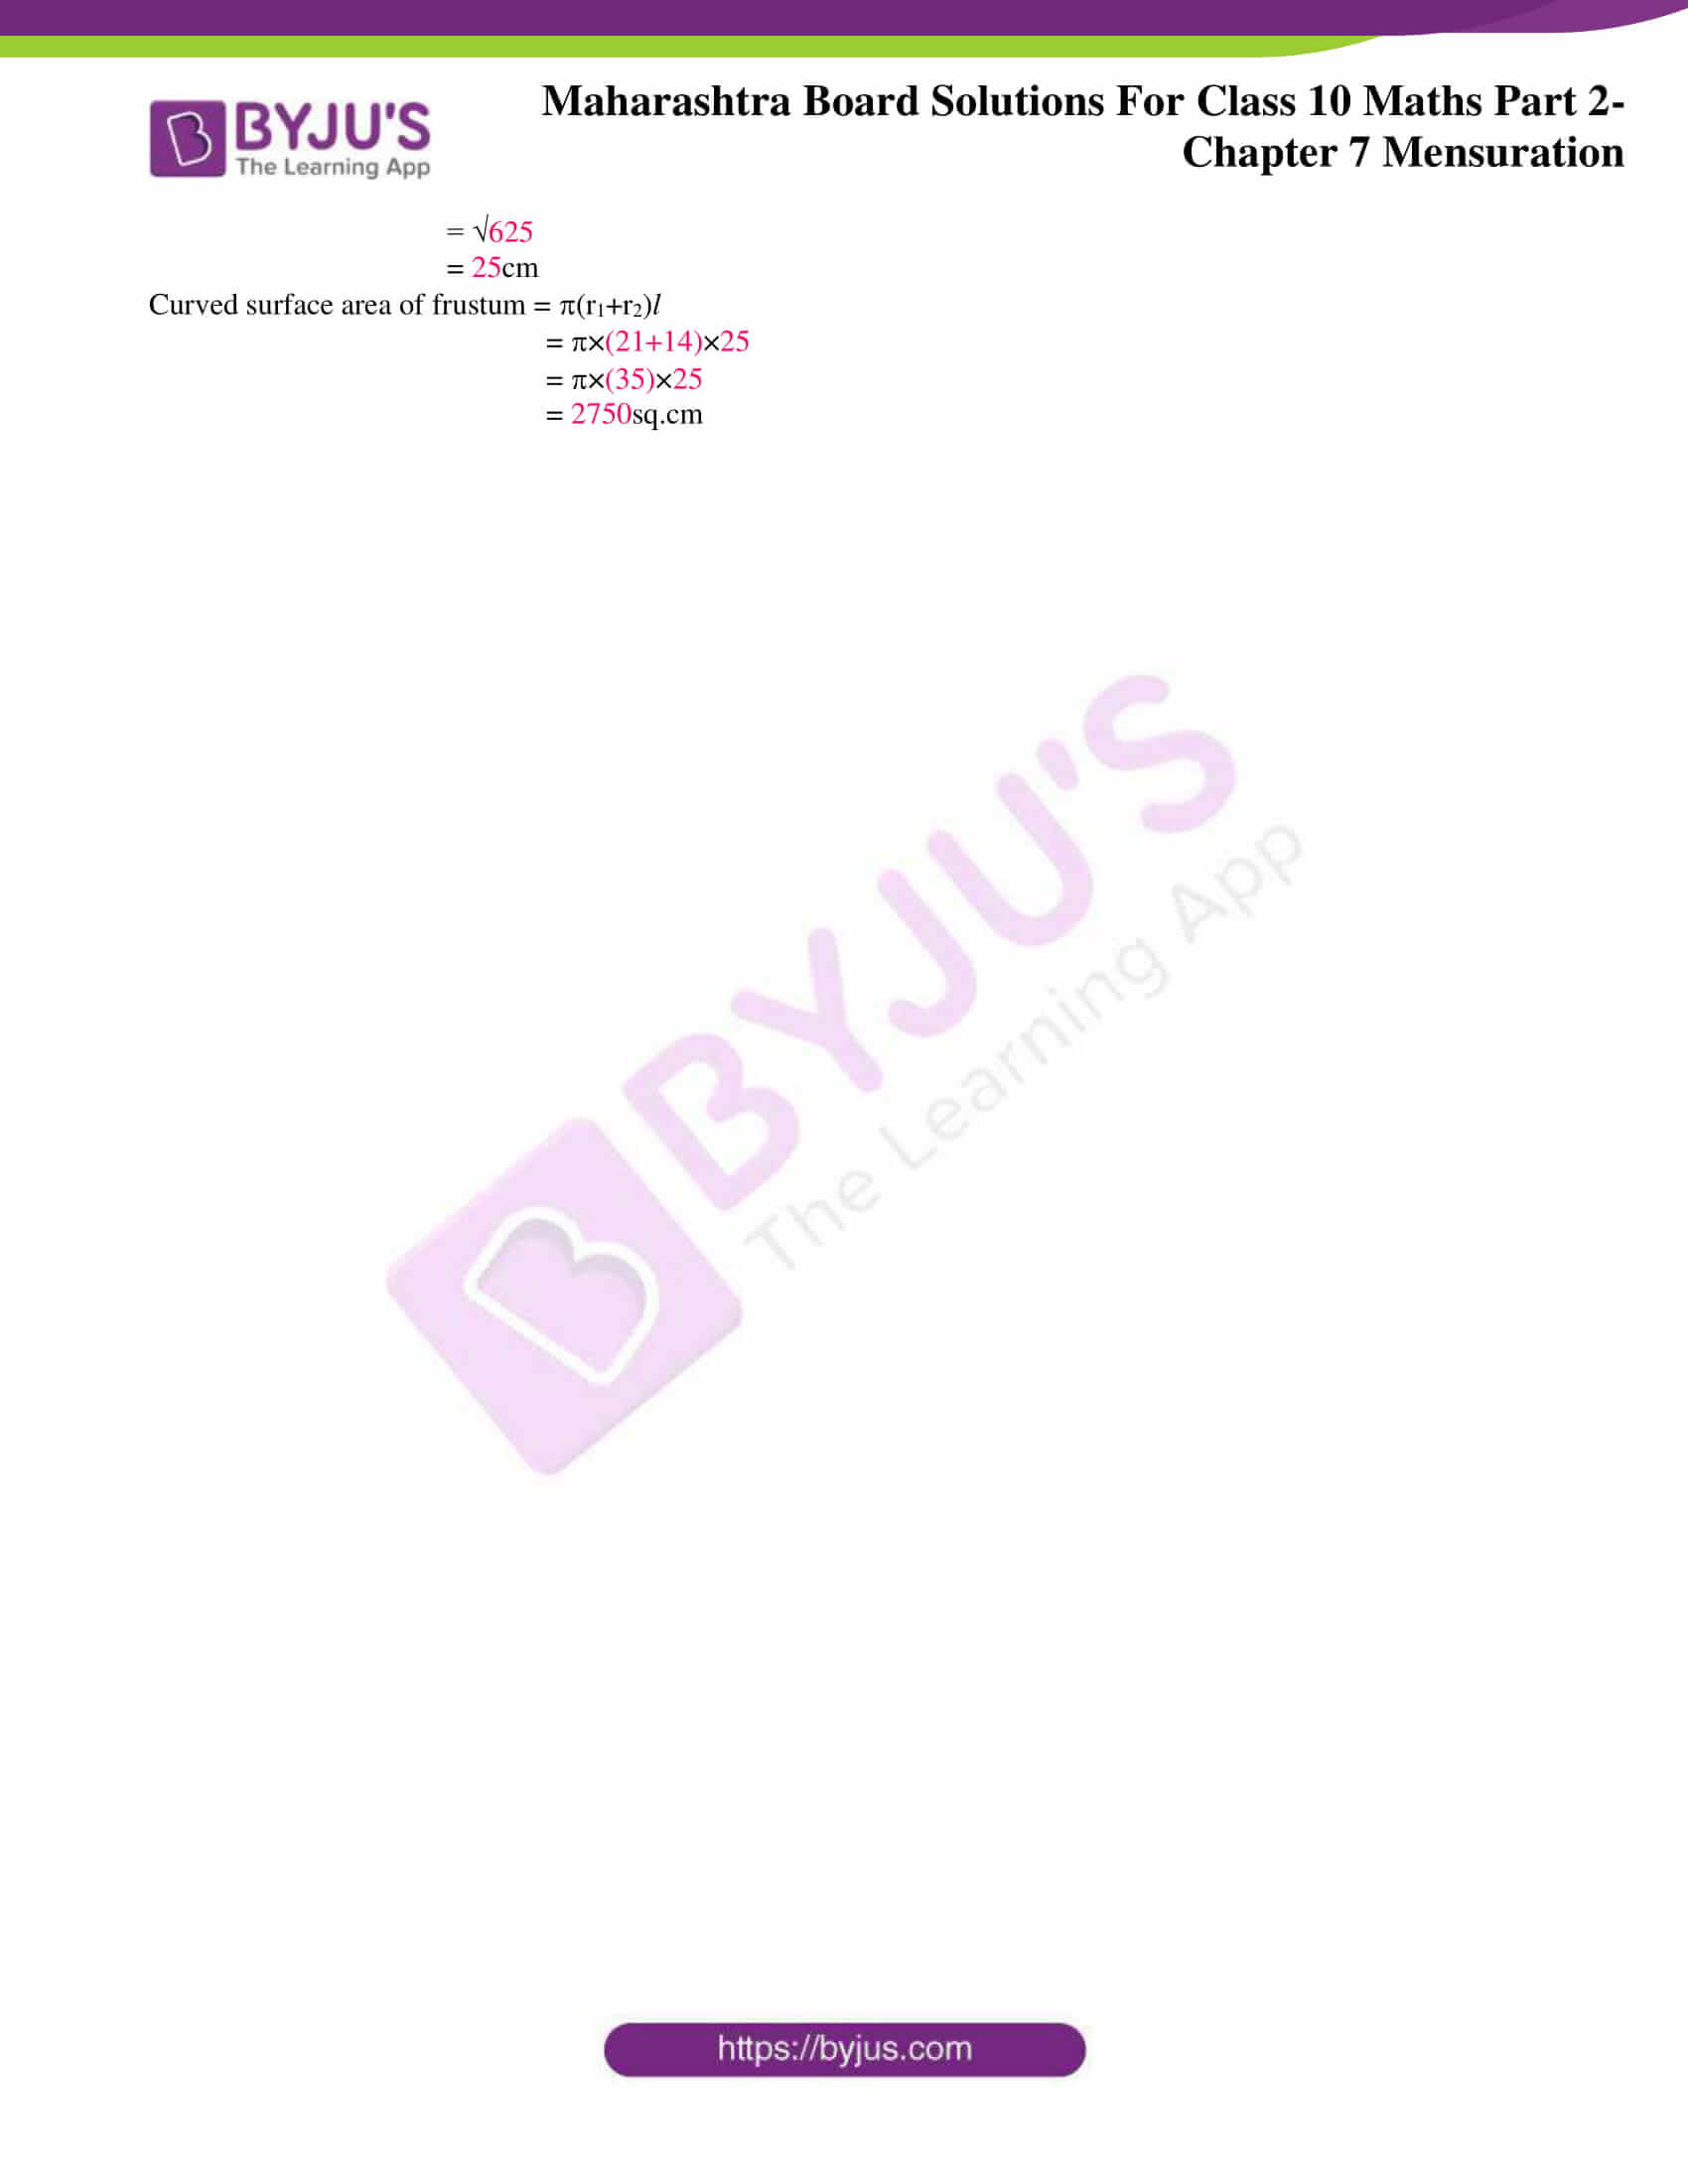 msbshse sol class 10 maths part 2 chapter 7 10